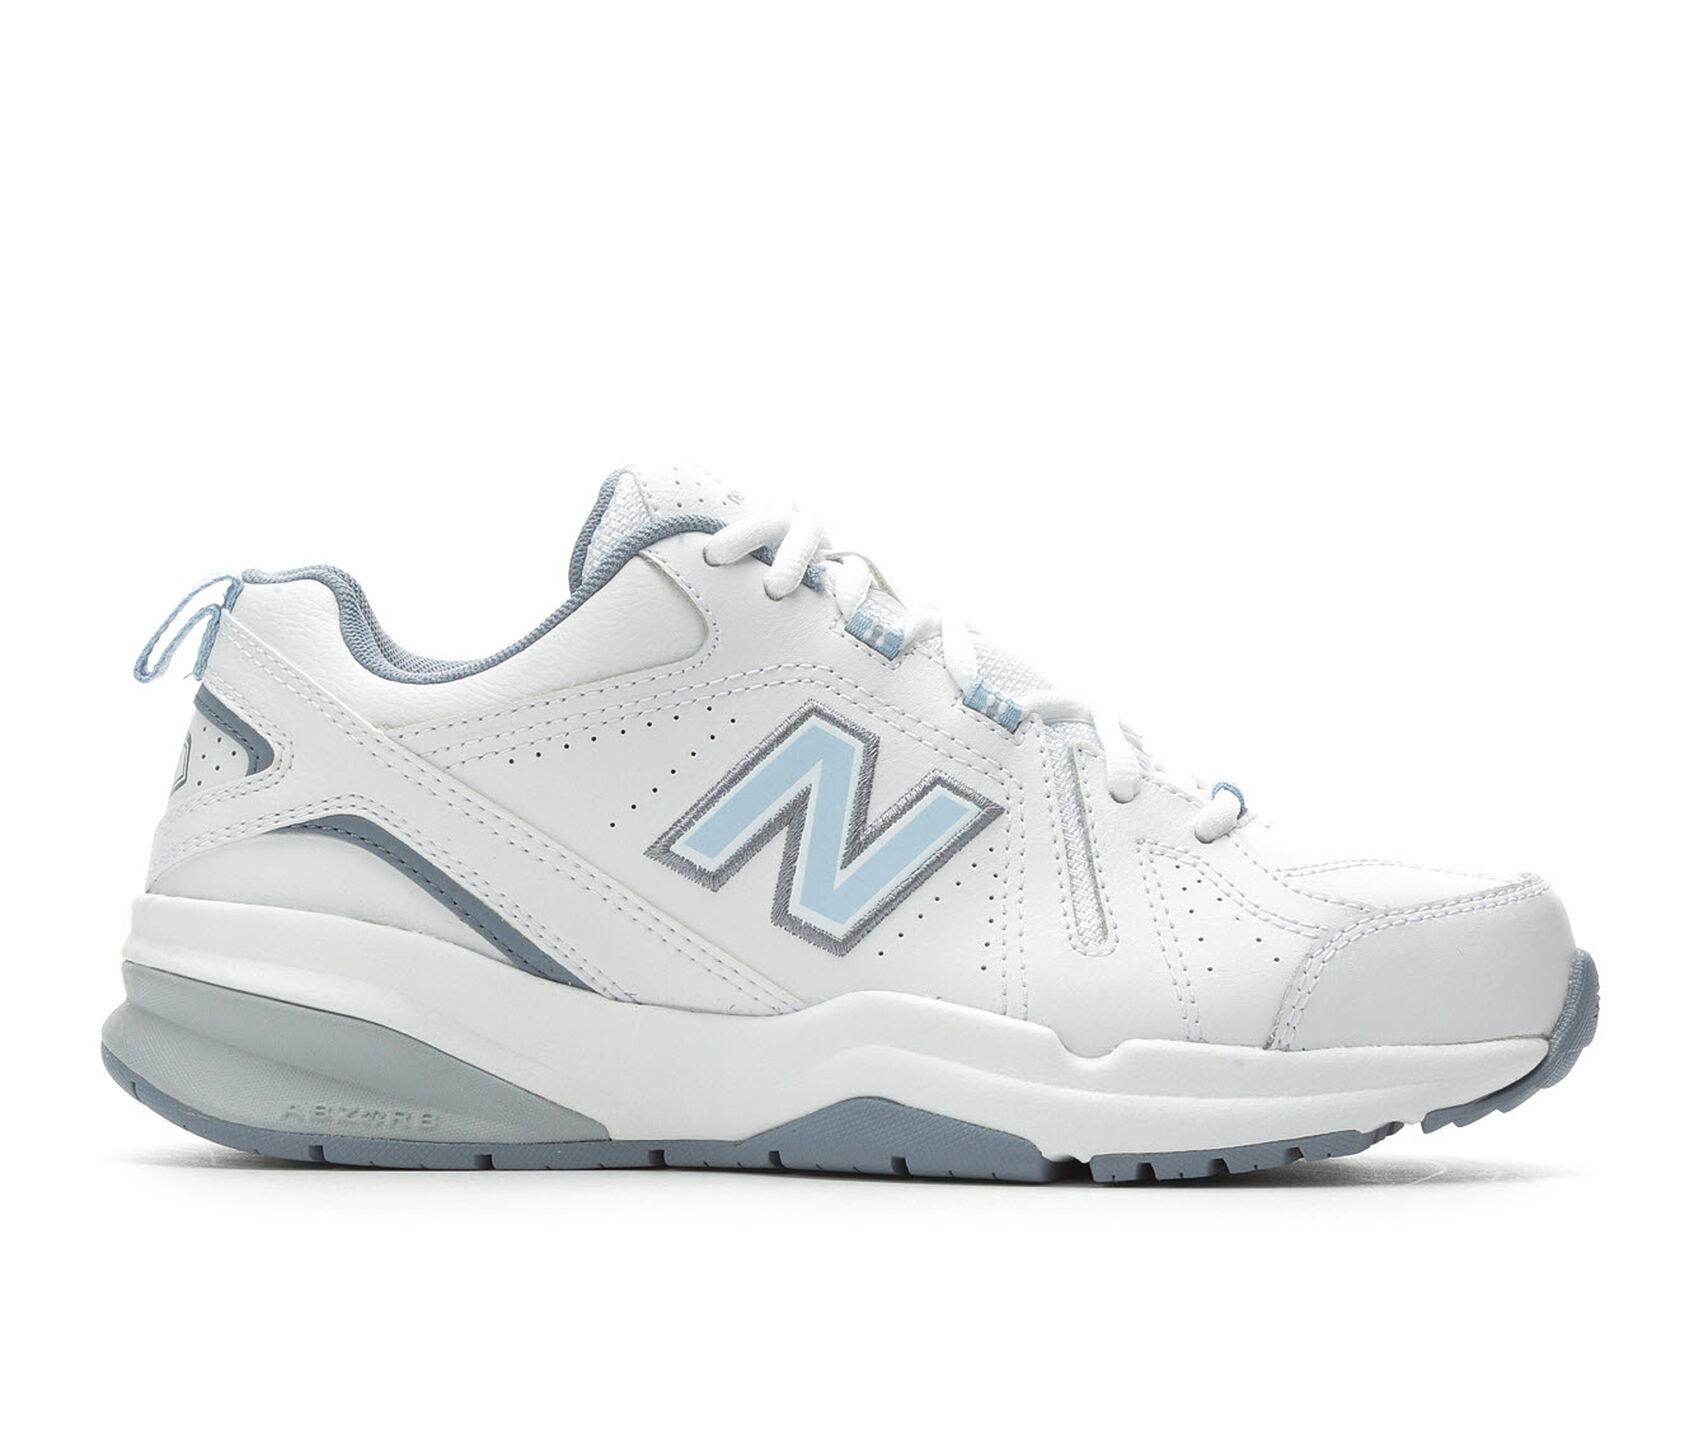 48a43025f0 Women's New Balance WX608V5 Training Shoes | Shoe Carnival